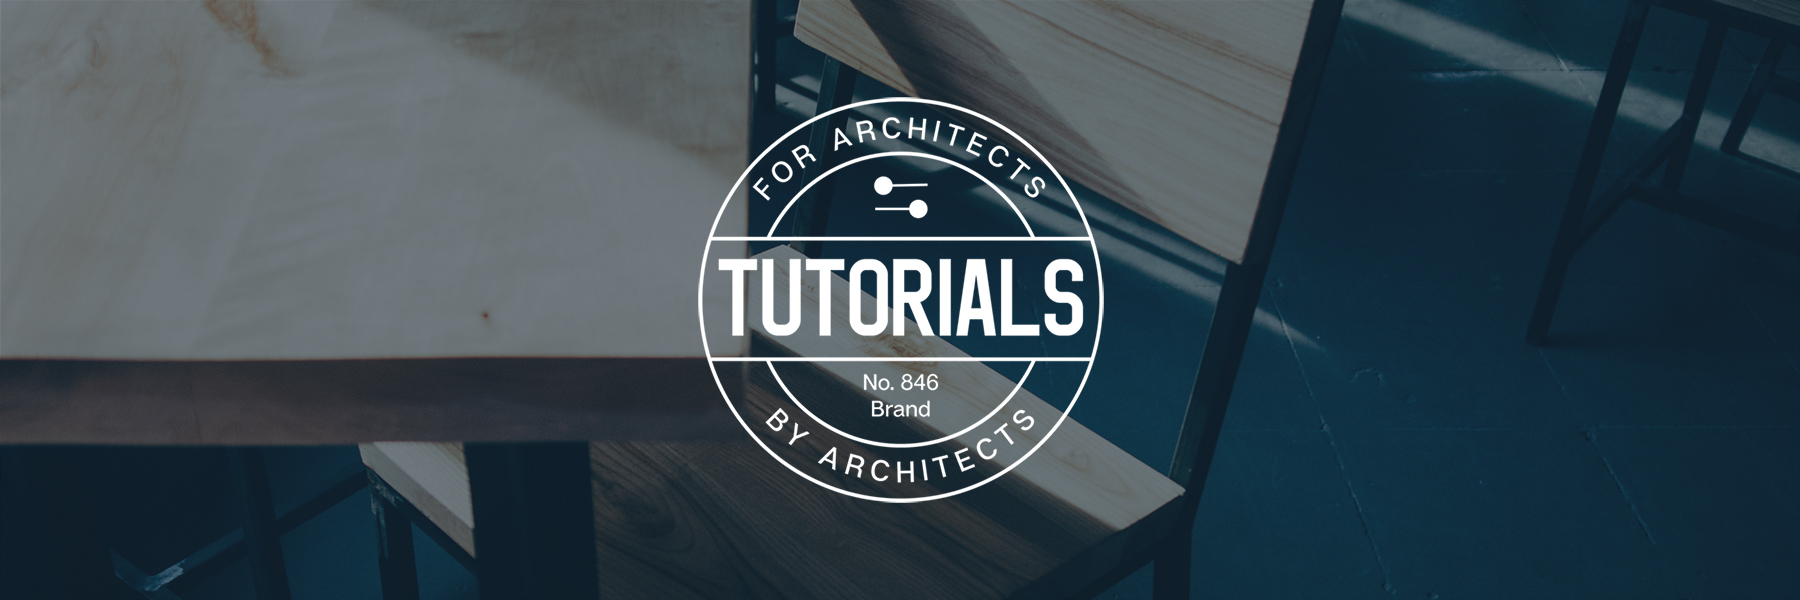 Watch a Tutorial   Architectural Training Hub   Hyperfine Academy